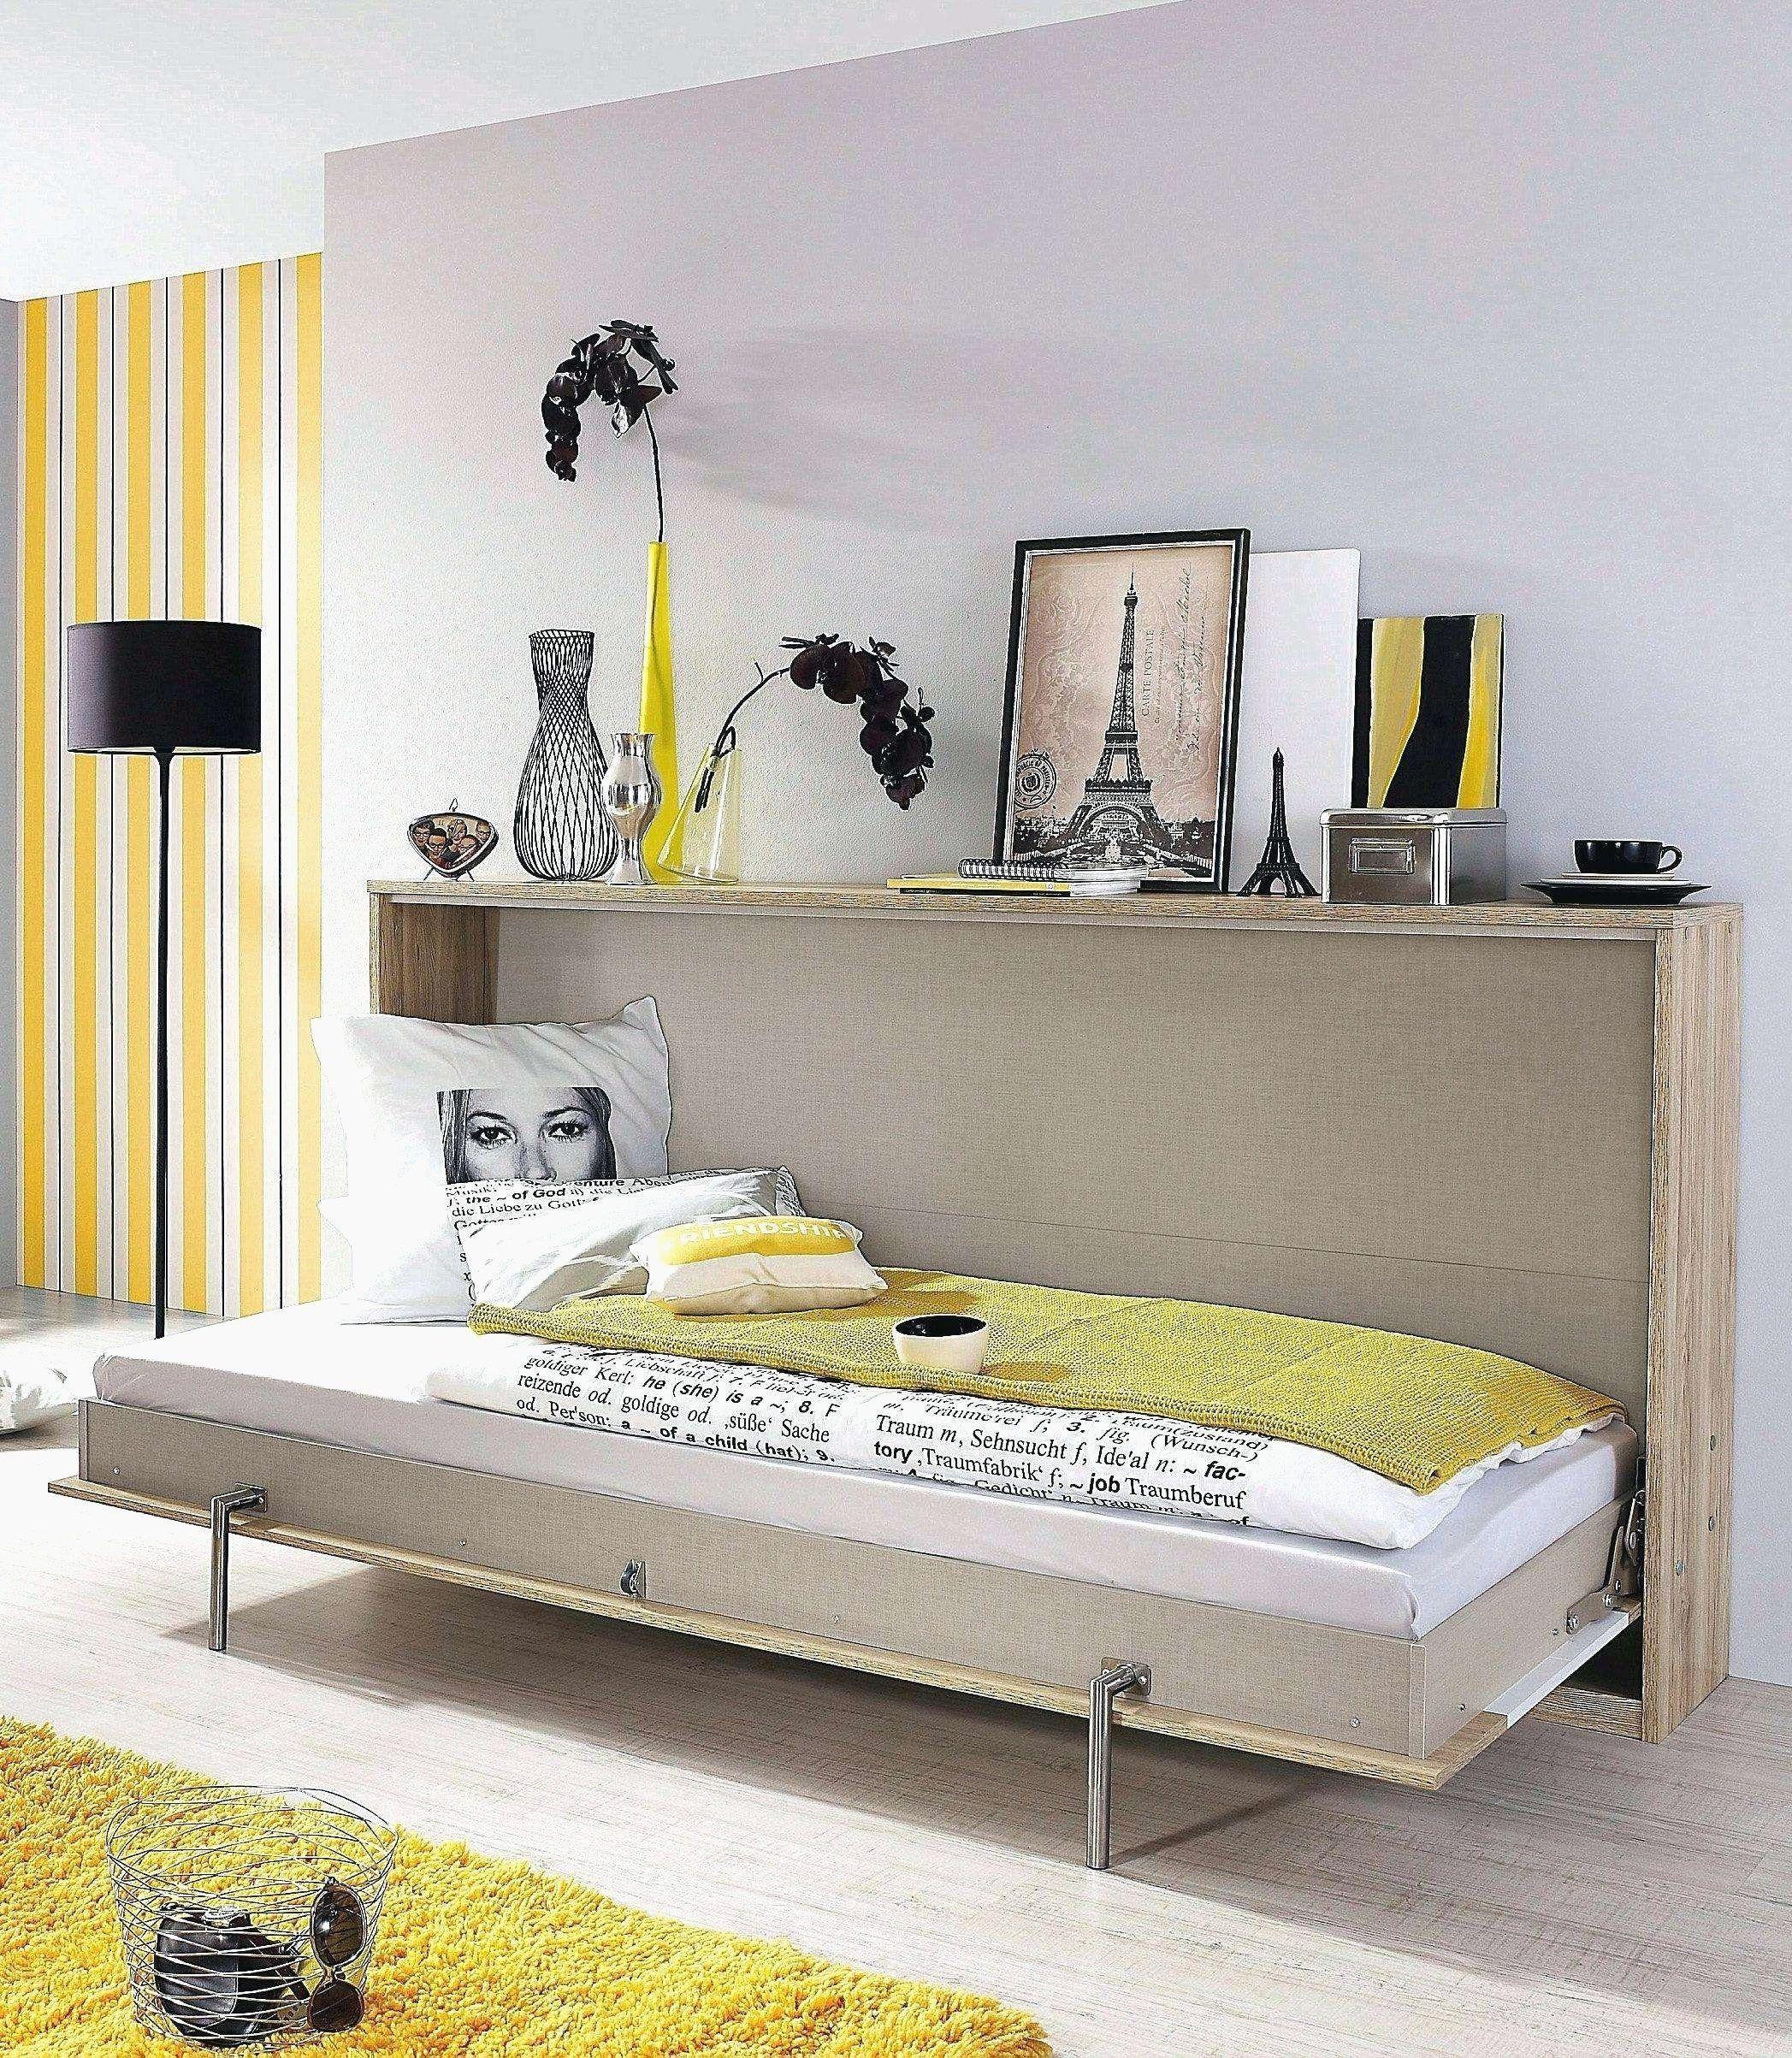 Beautiful Full Size Girl Bedroom Sets Mebel Dekorasi Kamar Tidur Anak Laki Laki Kamar Tidur Ikea